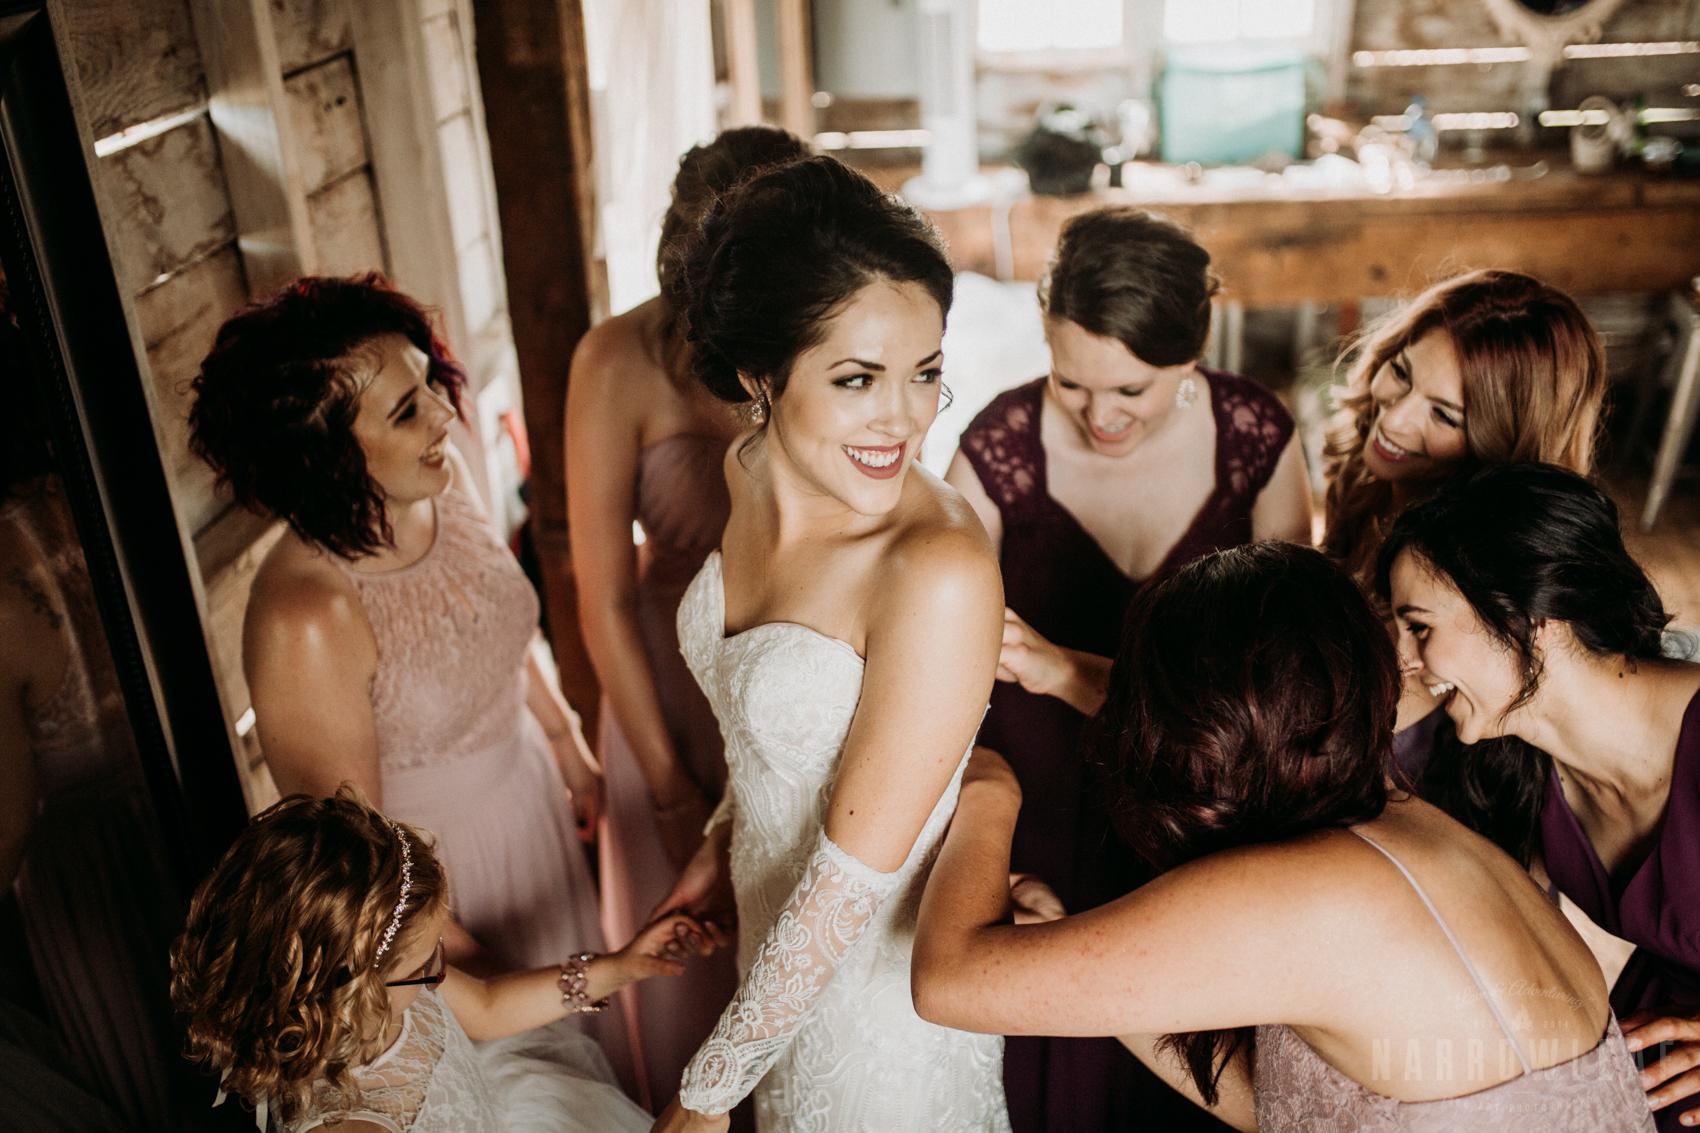 classy-bride-wedding-details-the-hidden-meadow-and-barn-pepin-wi-9.jpg